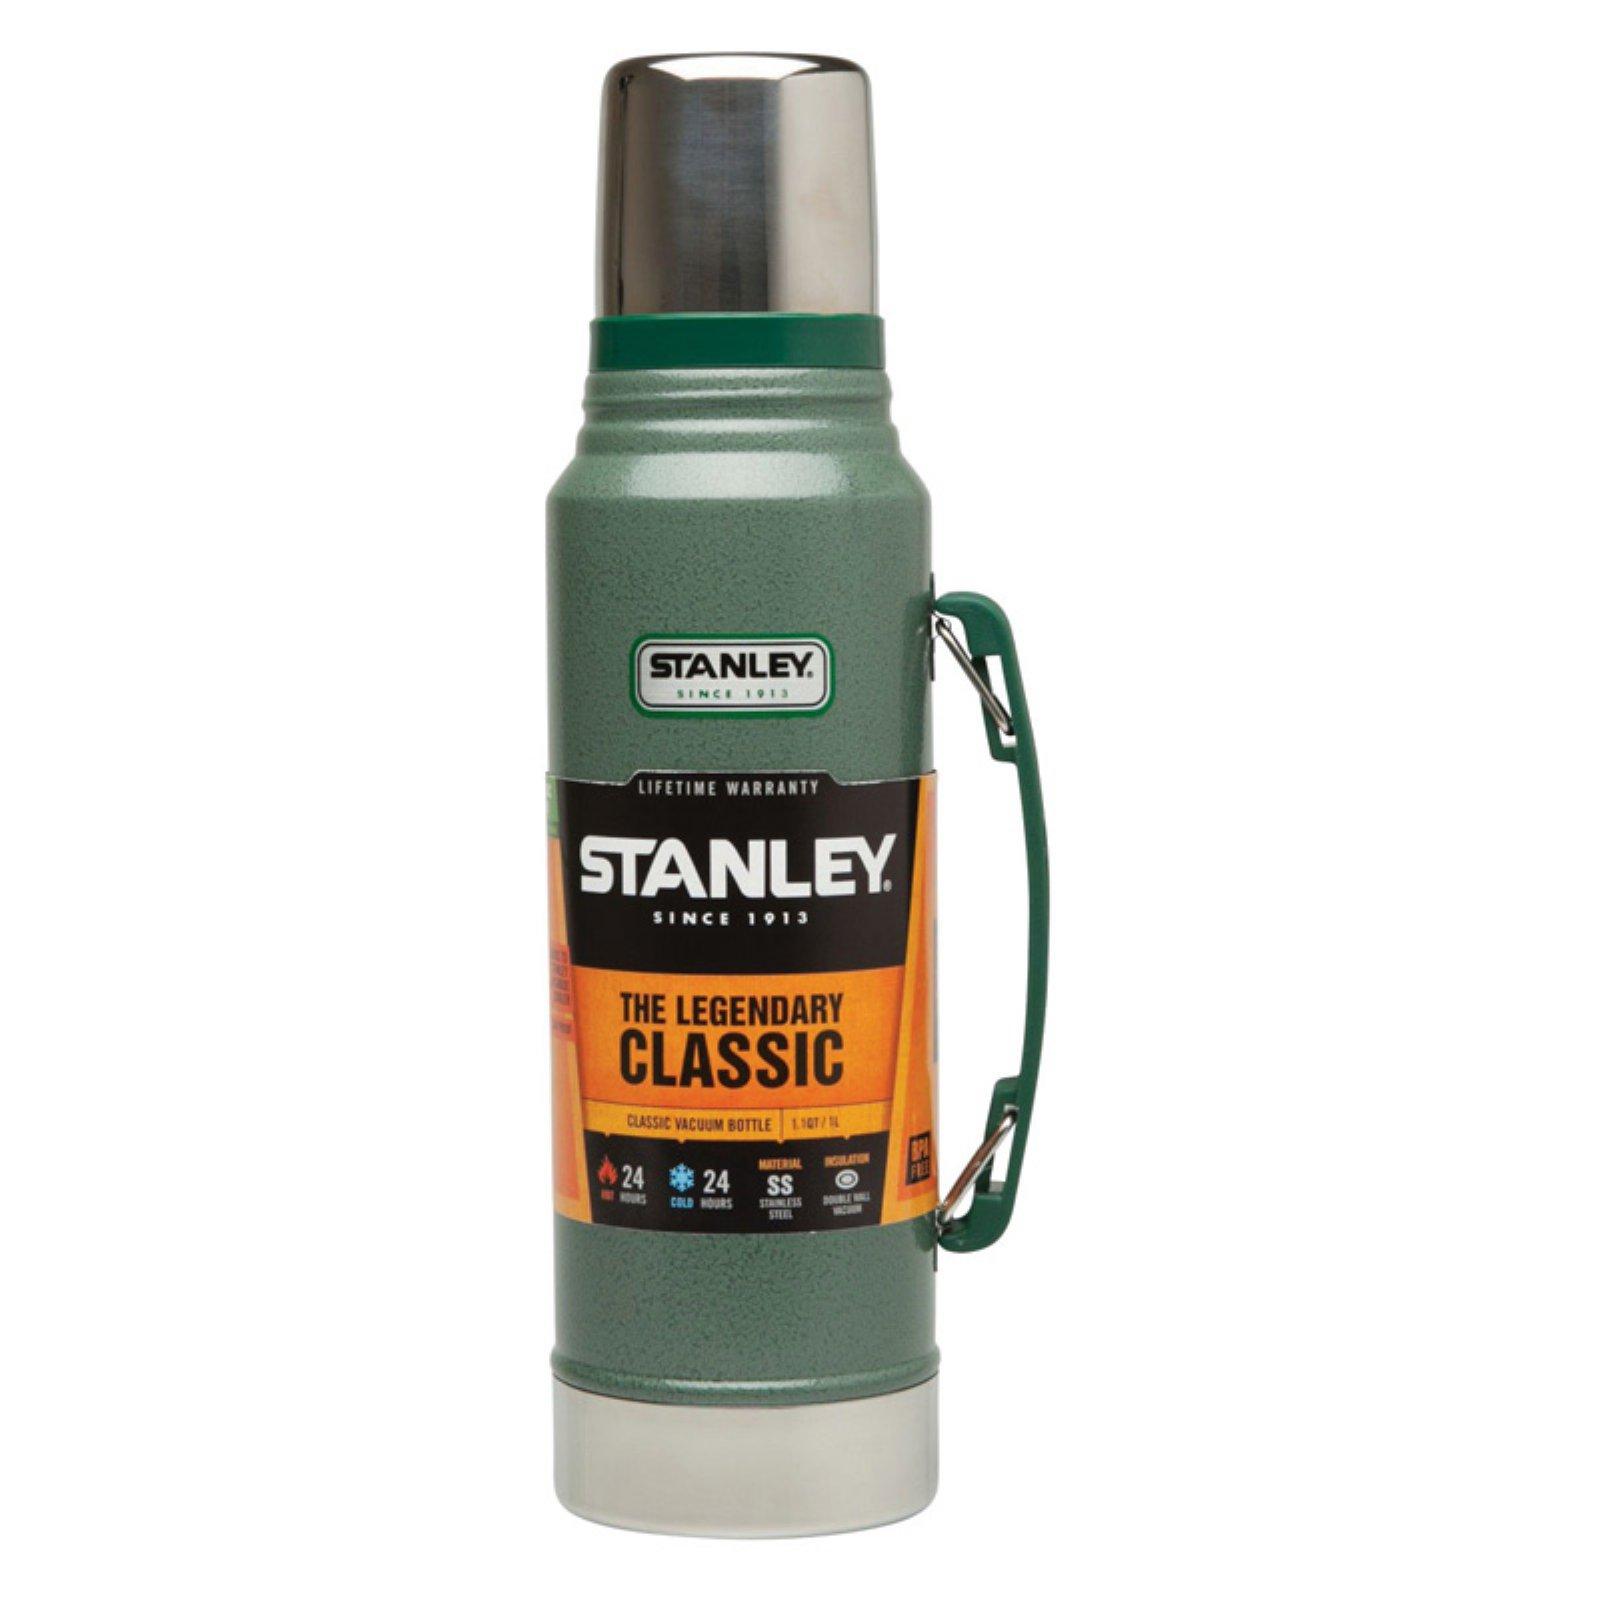 Stanley Classic Vacuum Bottle amazon warehouse $11.9